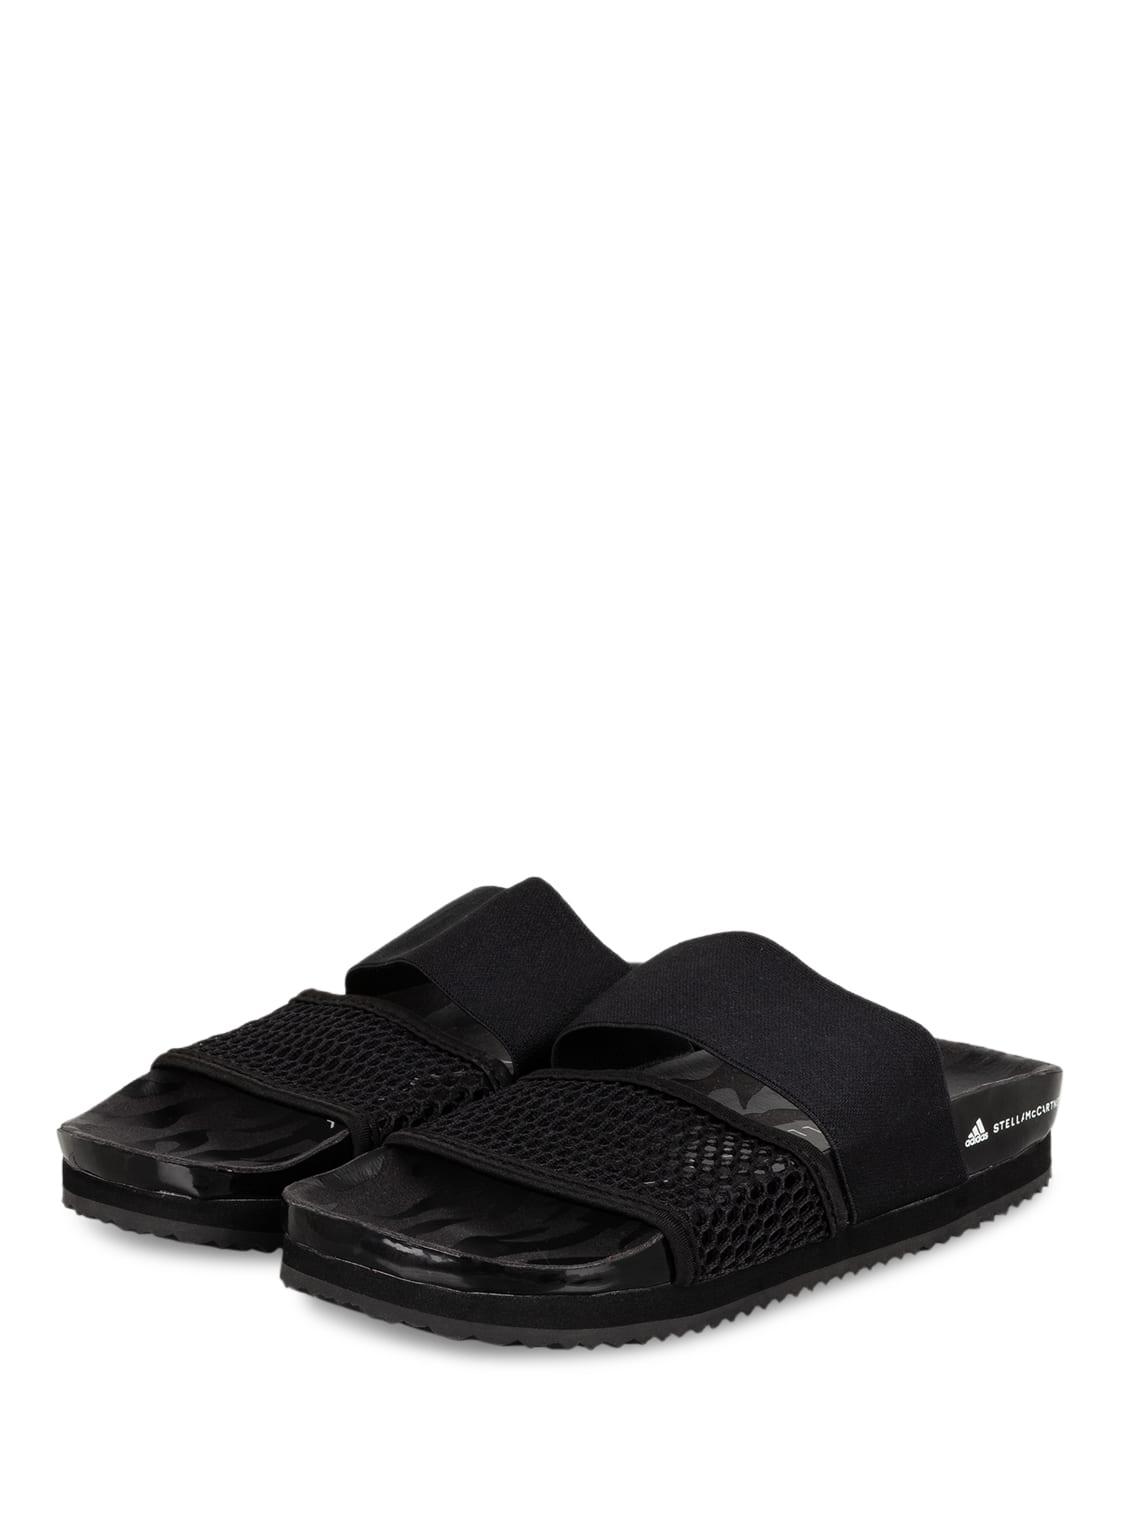 Image of Adidas By Stella Mccartney Pantolette Lette schwarz